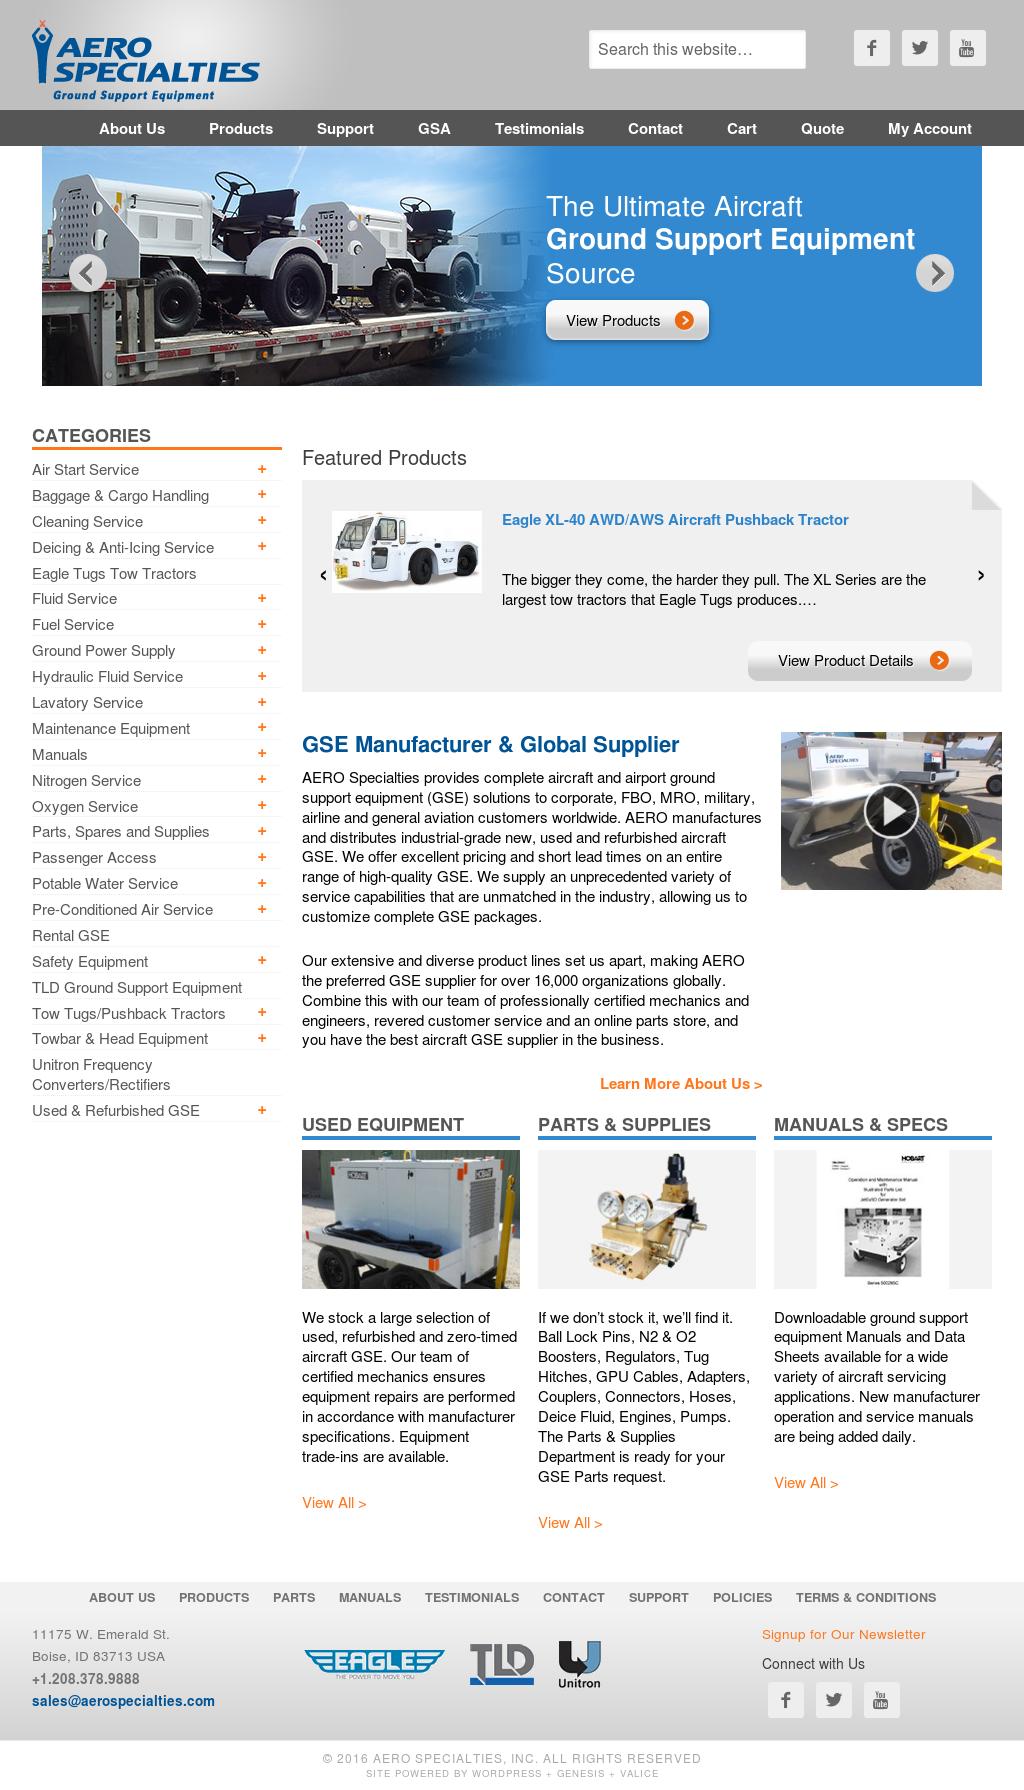 AERO Competitors, Revenue and Employees - Owler Company Profile